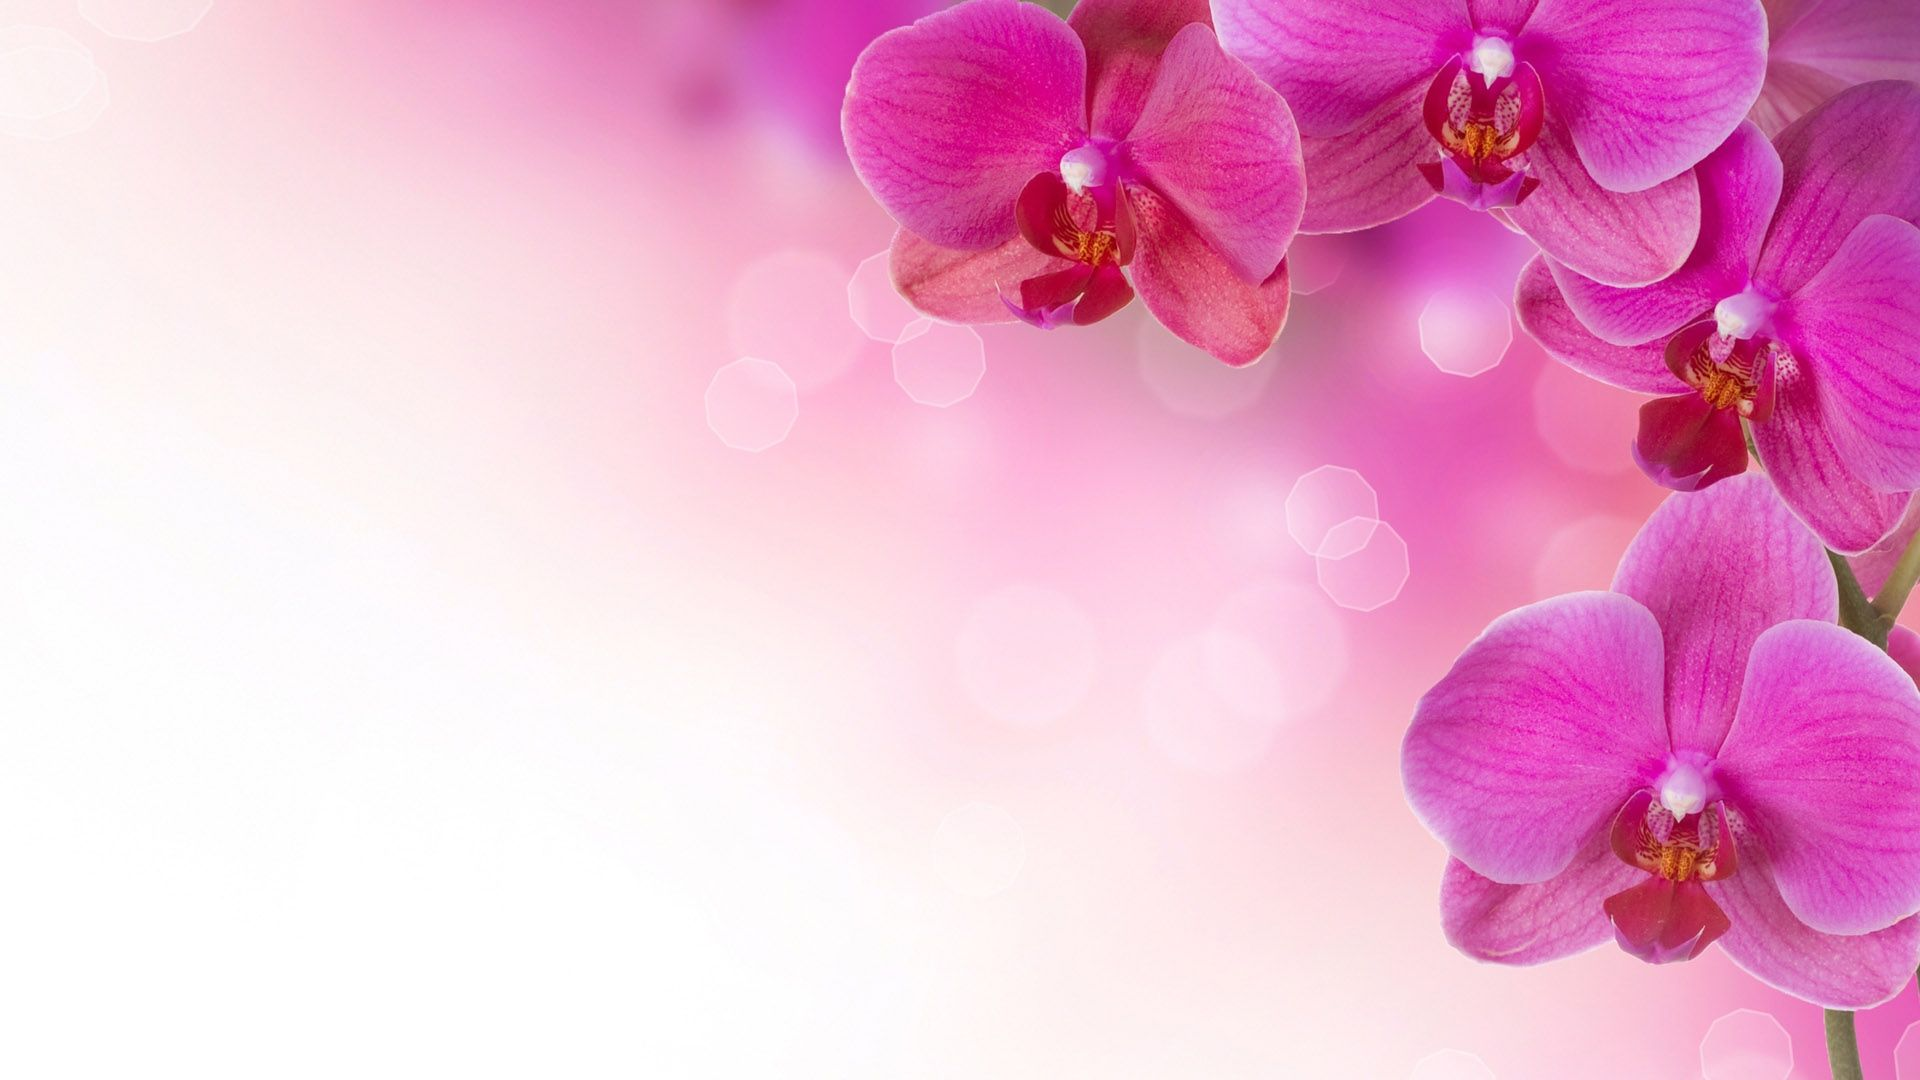 Download Wallpaper 3840x2400 Orchid Flower Branch Sky Ultra Hd 4k Hd Background Orchid Wallpaper Orchids Purple Spring Flowers